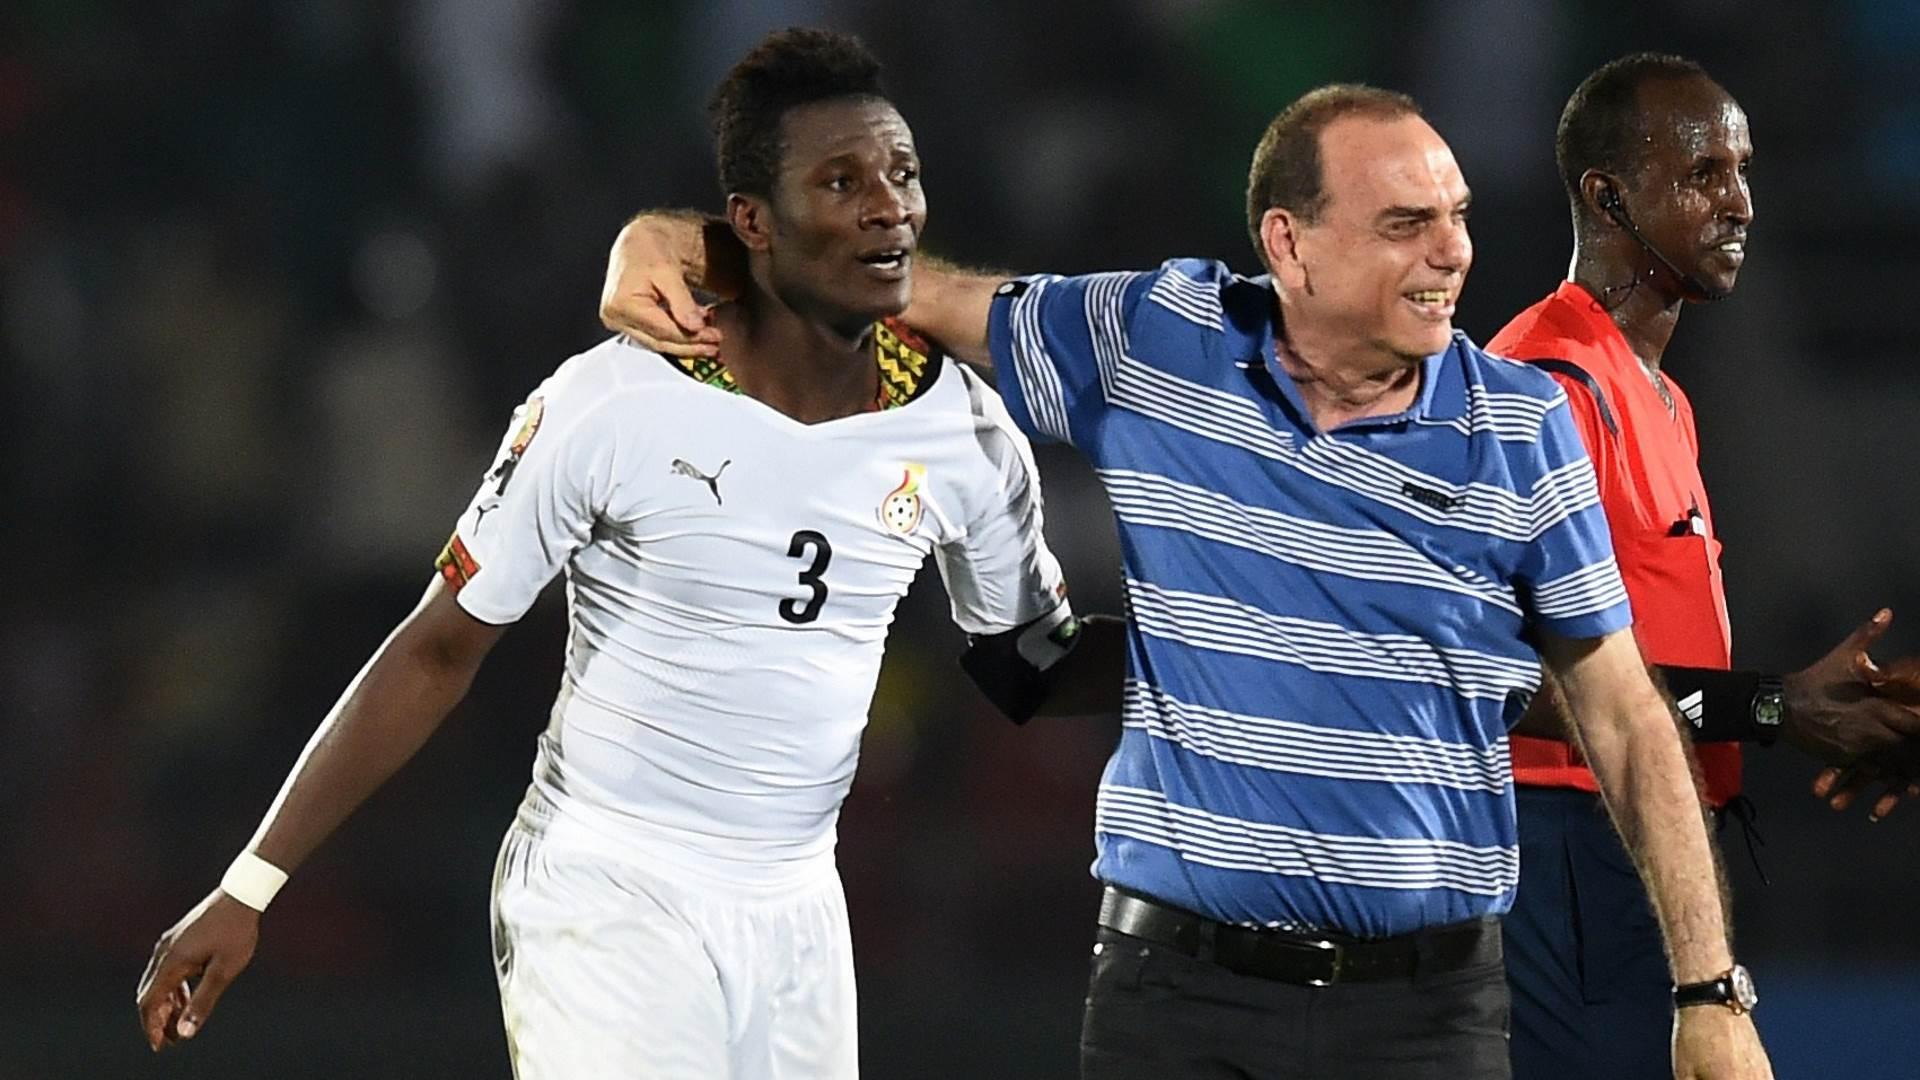 Avram Grant: Asamoah Gyan's biggest mistake was leaving English Premier League